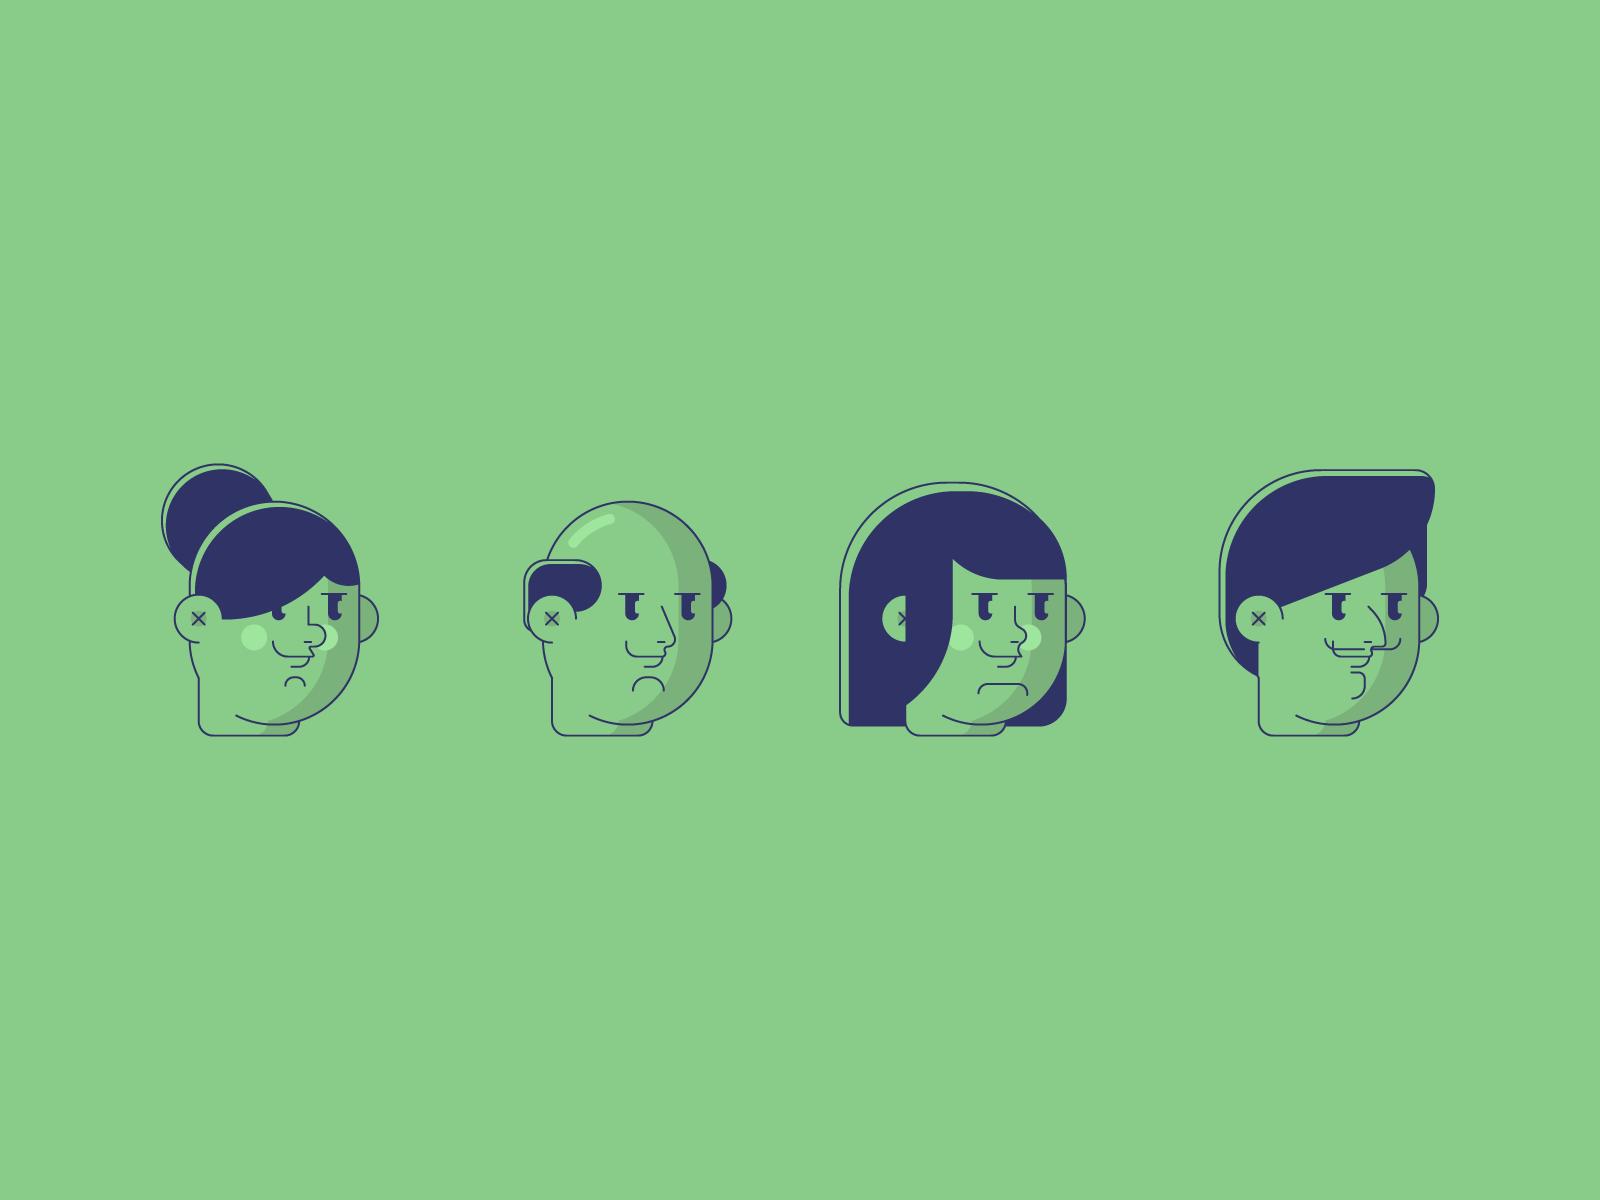 Faces 4x